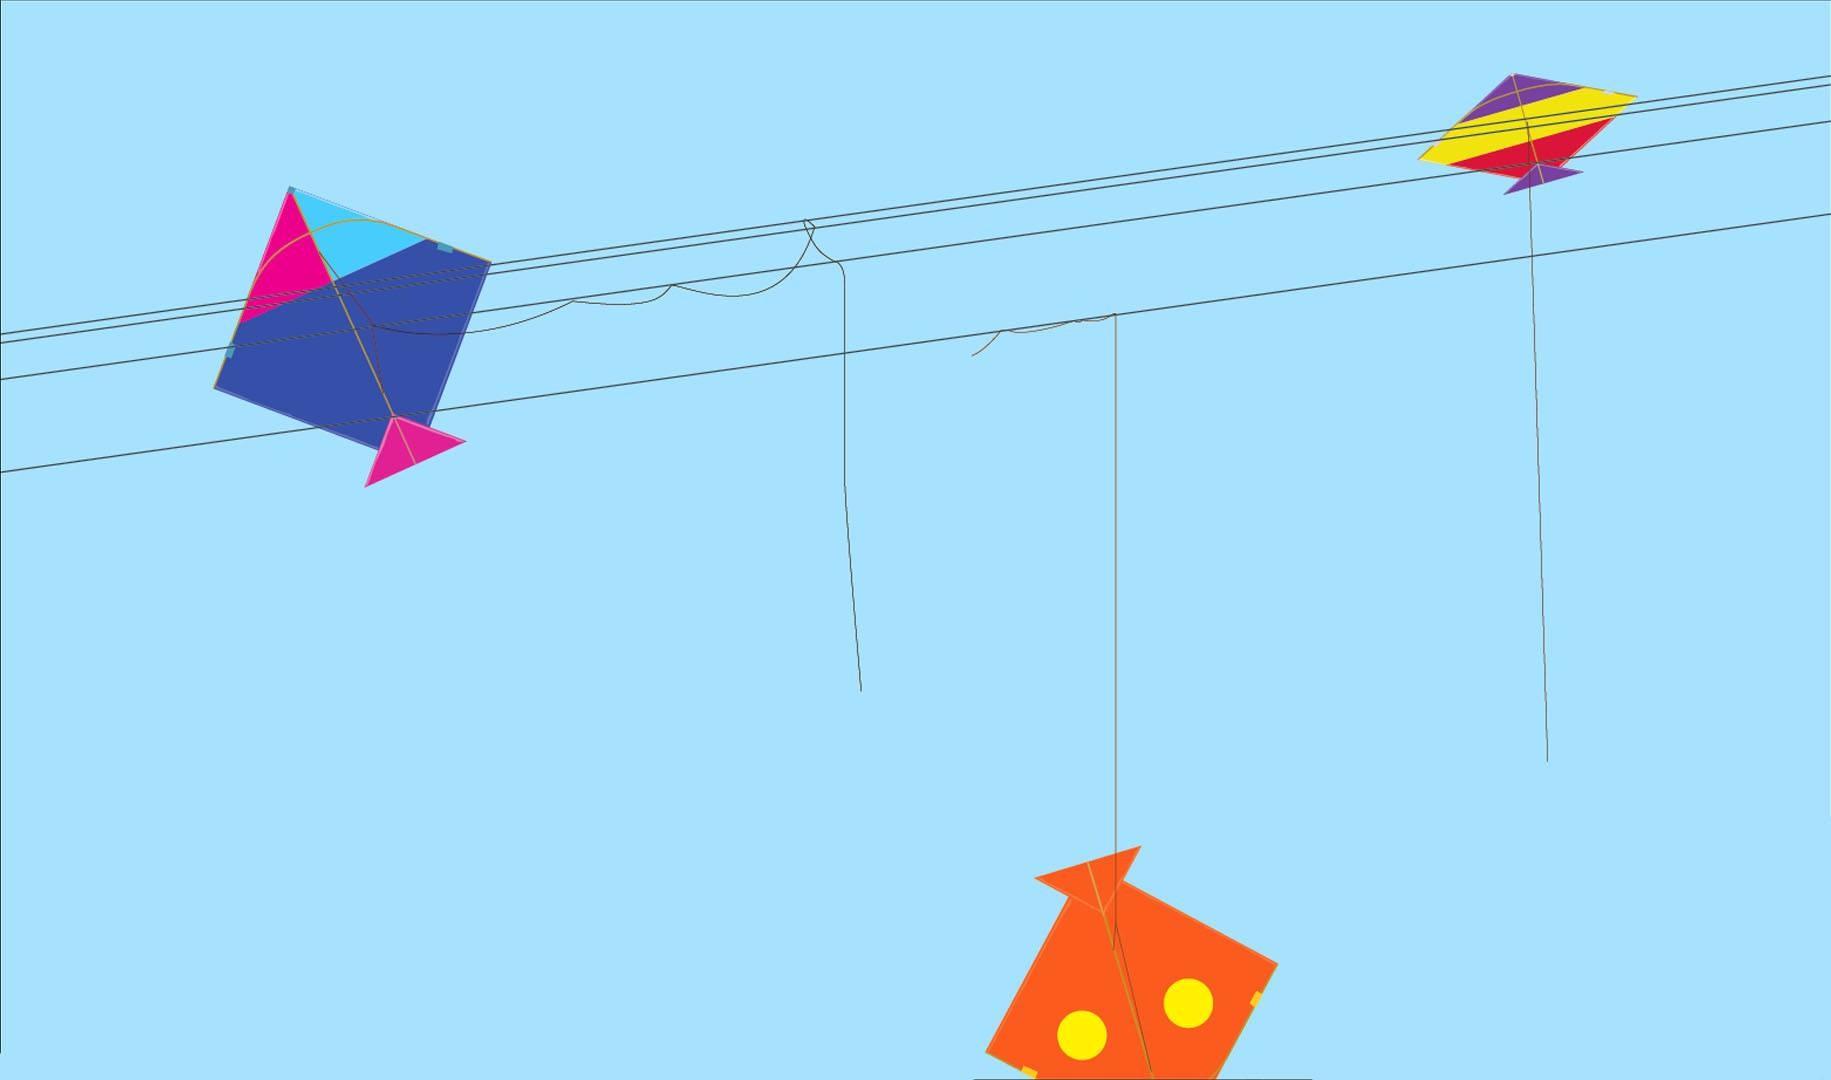 Rajesh sawant kitesbig